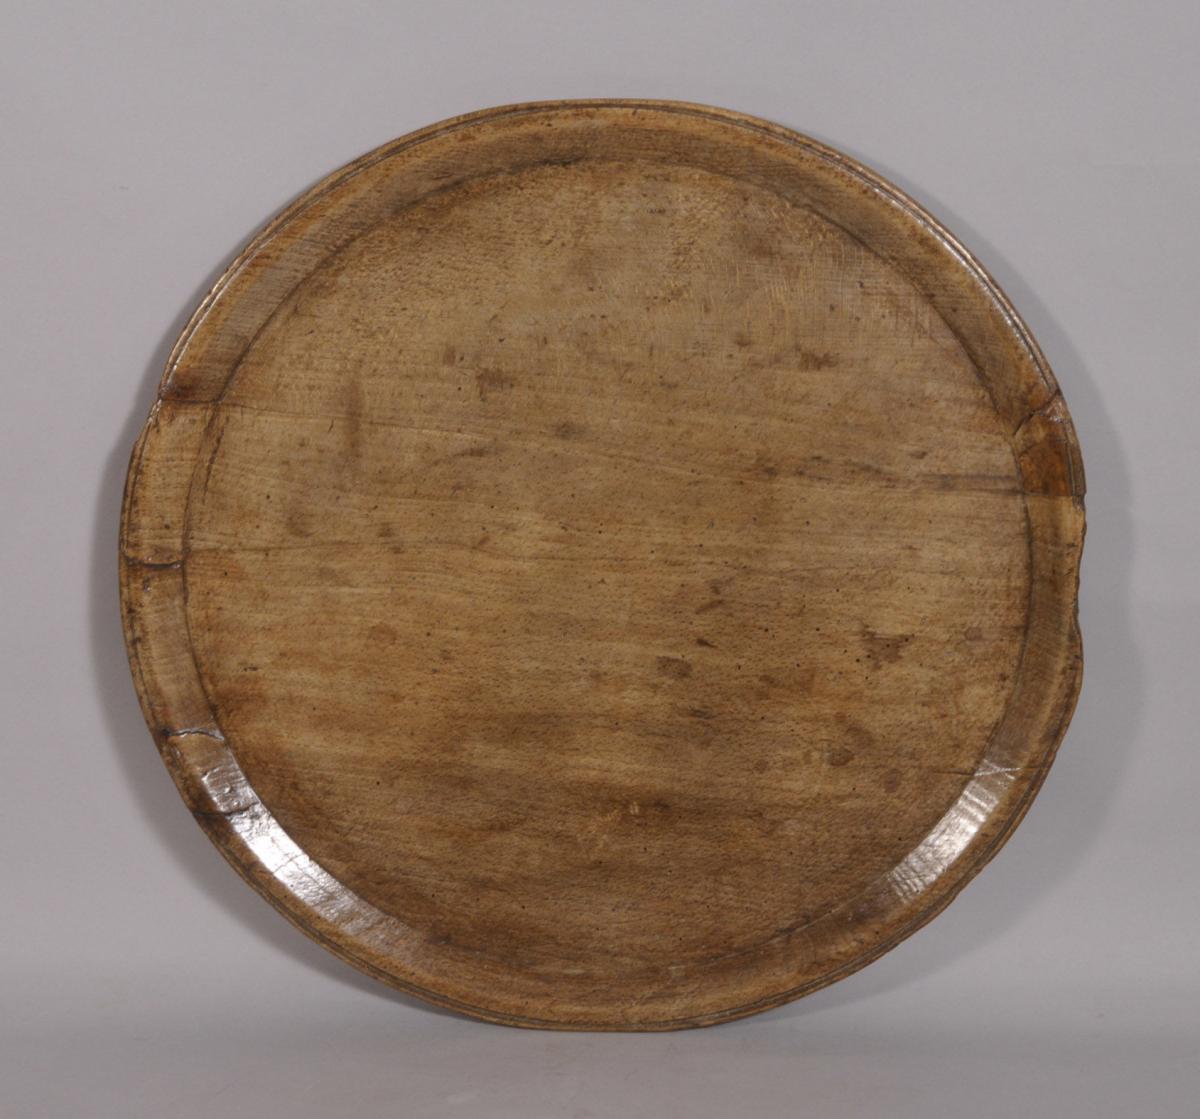 S/3455 Antique Treen 18th Century Beech Serving Dish